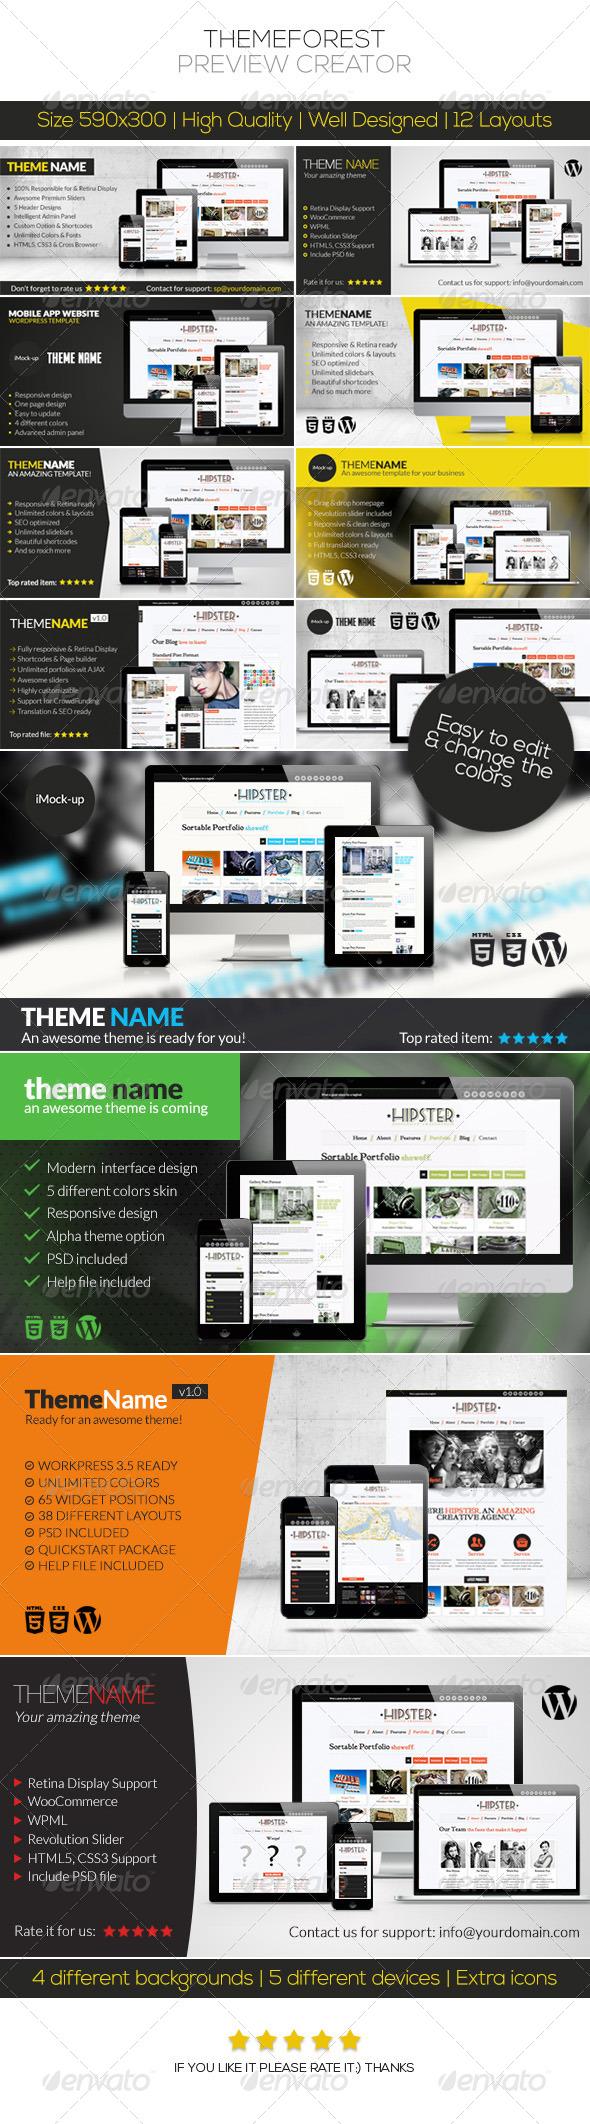 GraphicRiver ThemeForest Preview Creator 4840388